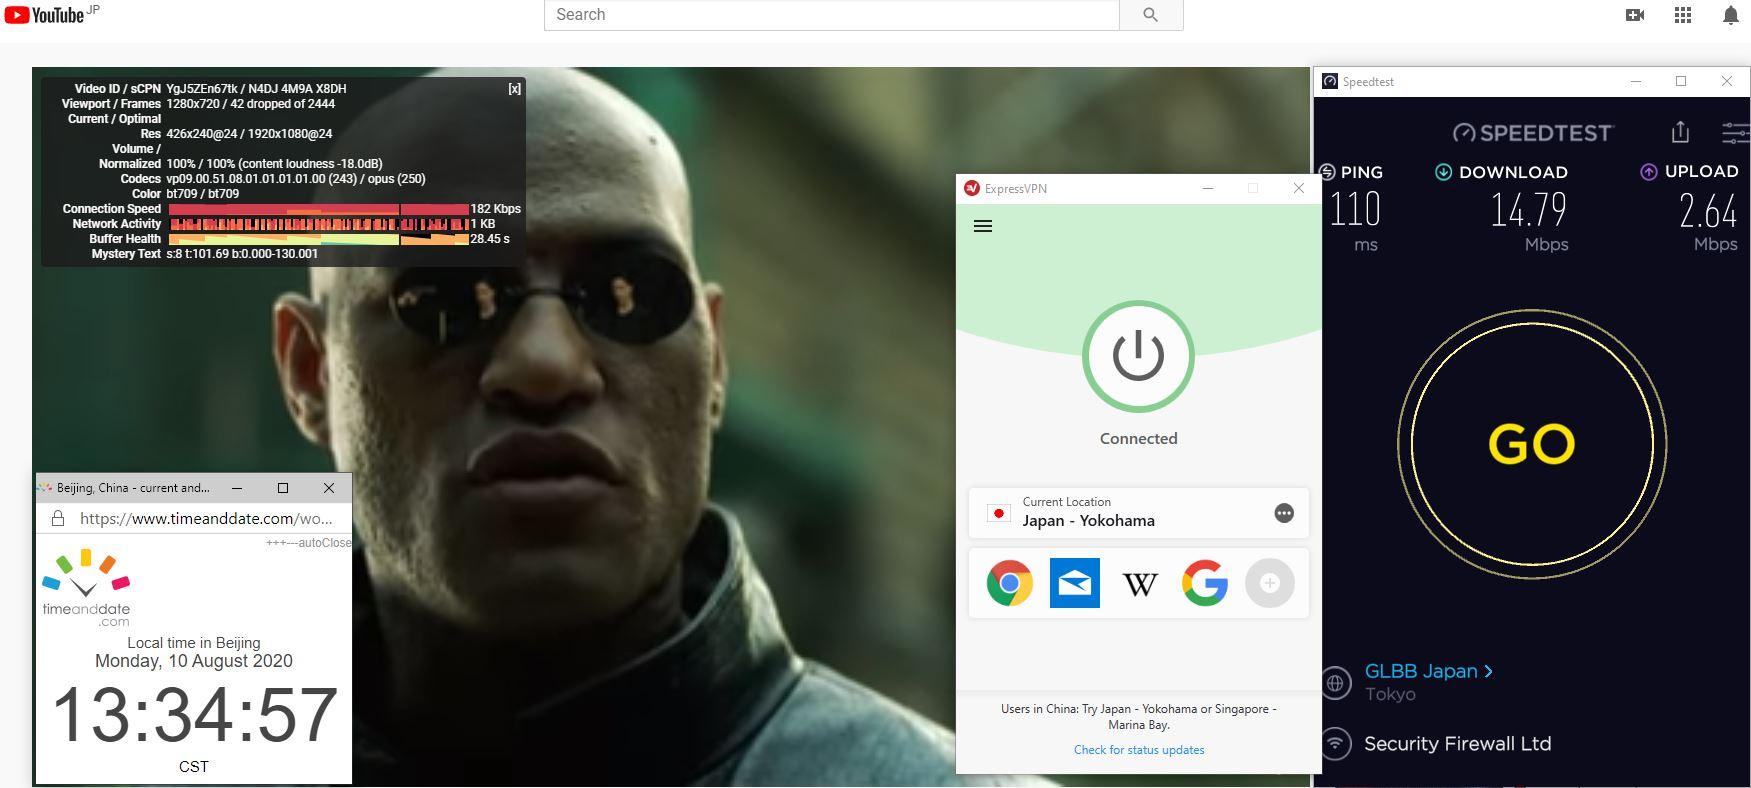 Windows10 ExpressVPN Auto协议 Japan - Yokohama 中国VPN 翻墙 科学上网 翻墙速度测试 - 20200810